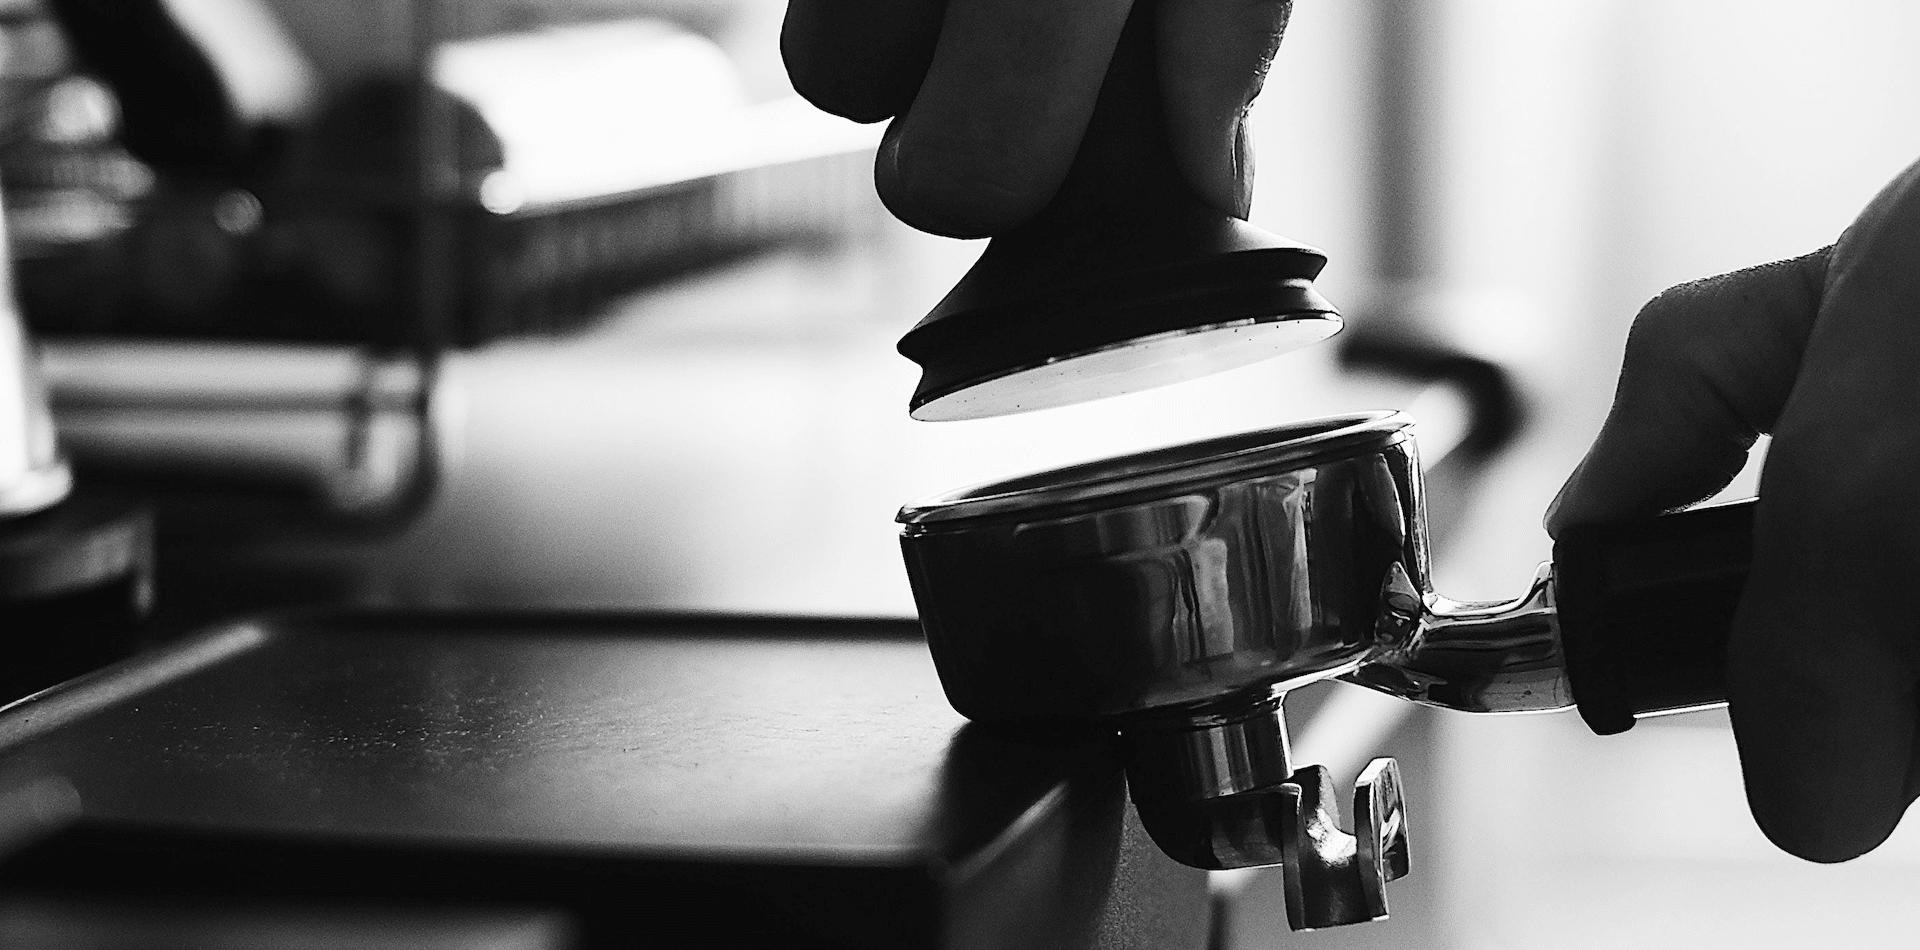 barista pressing coffee